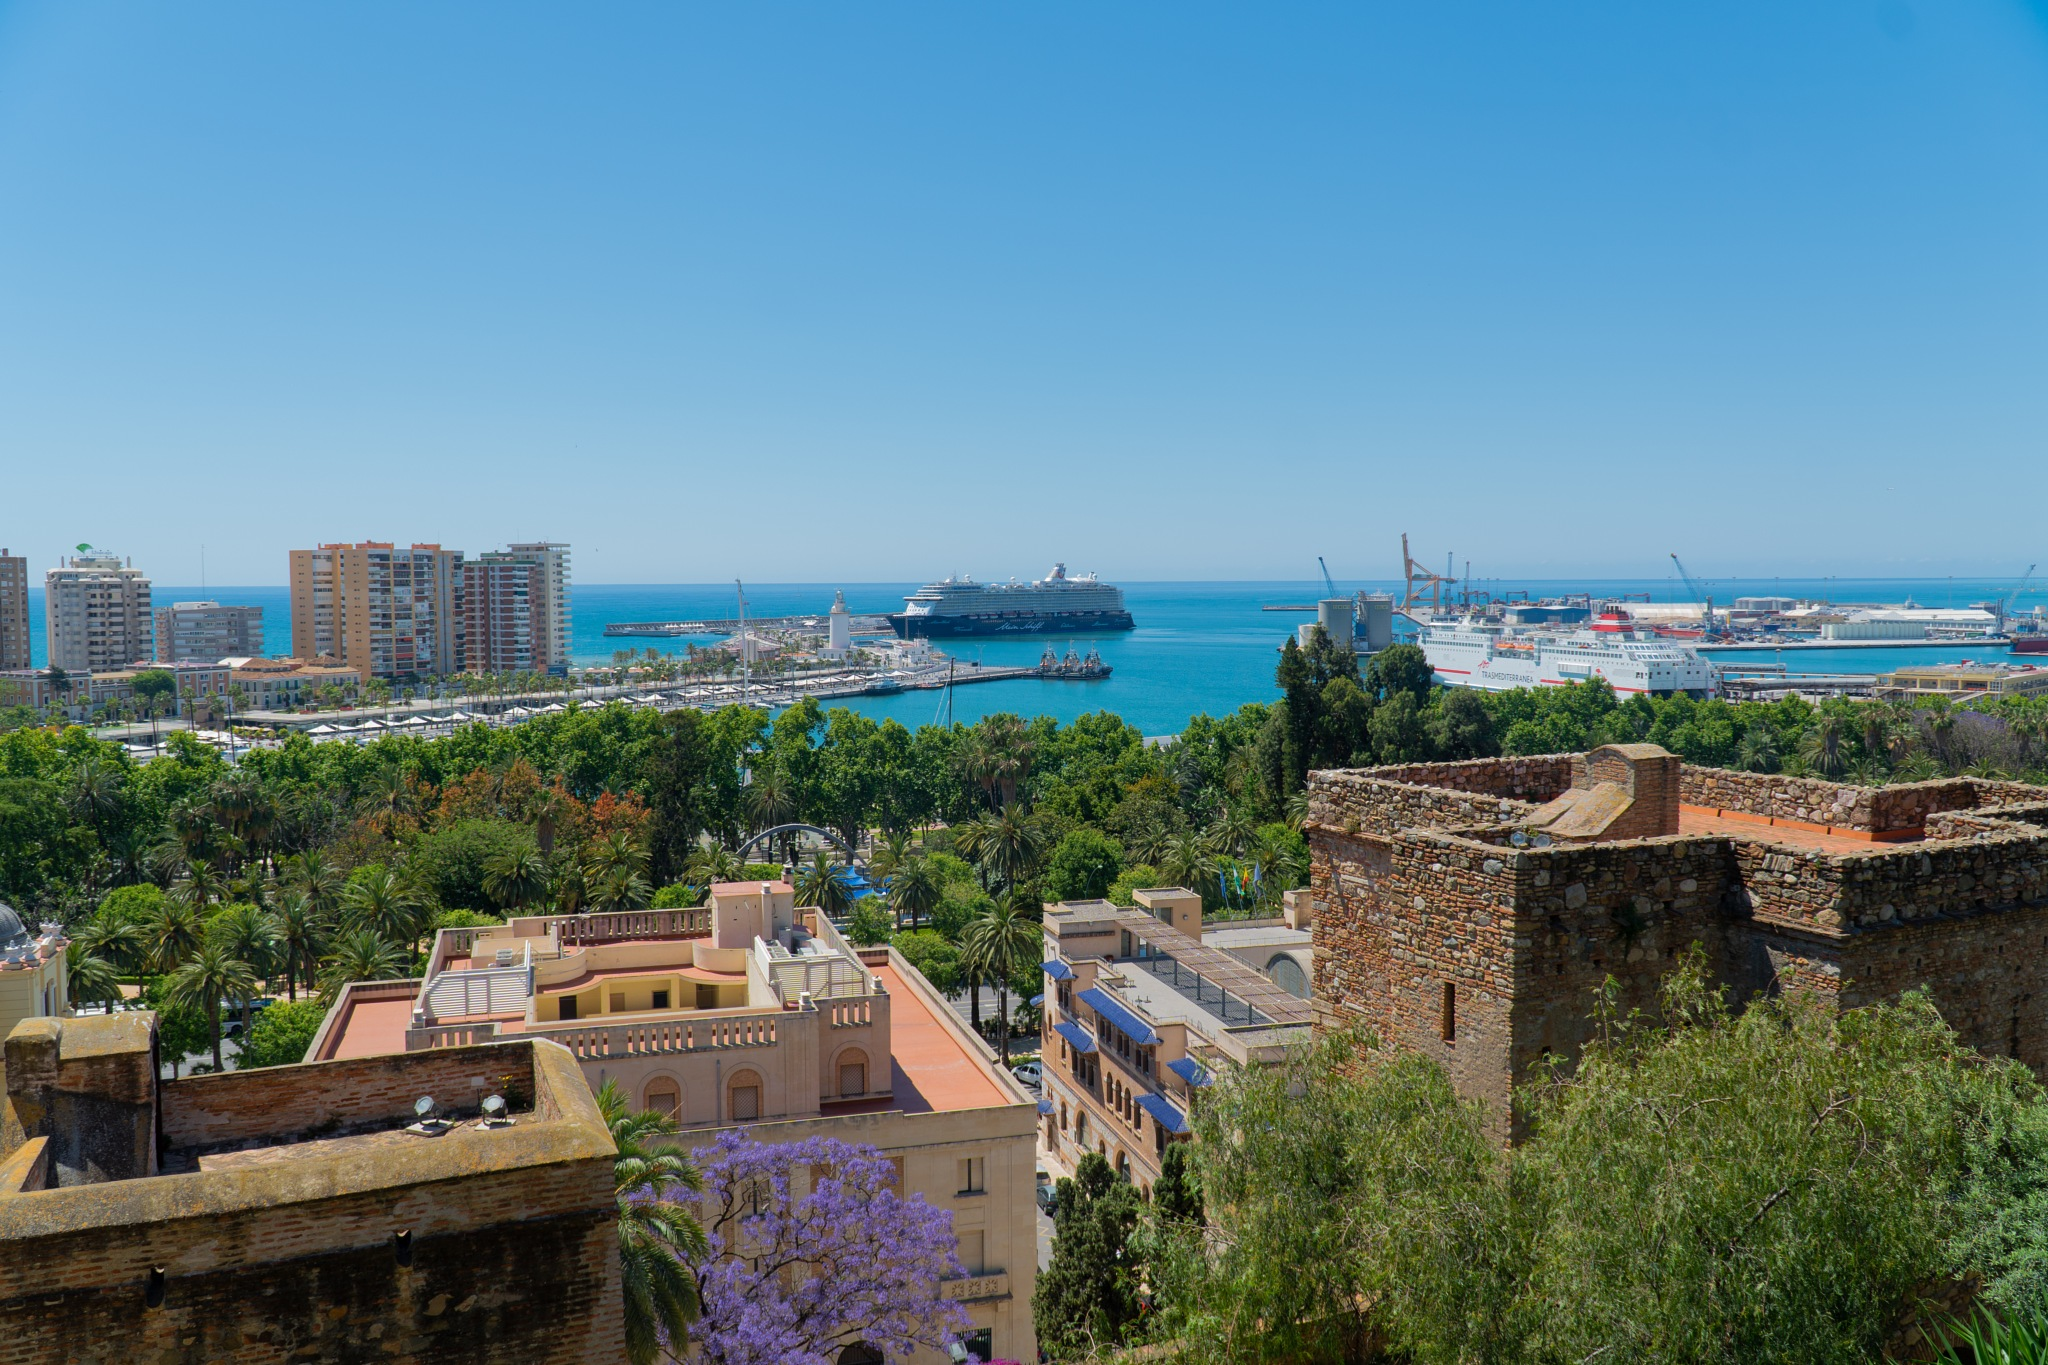 View of Malaga by Lukeghost